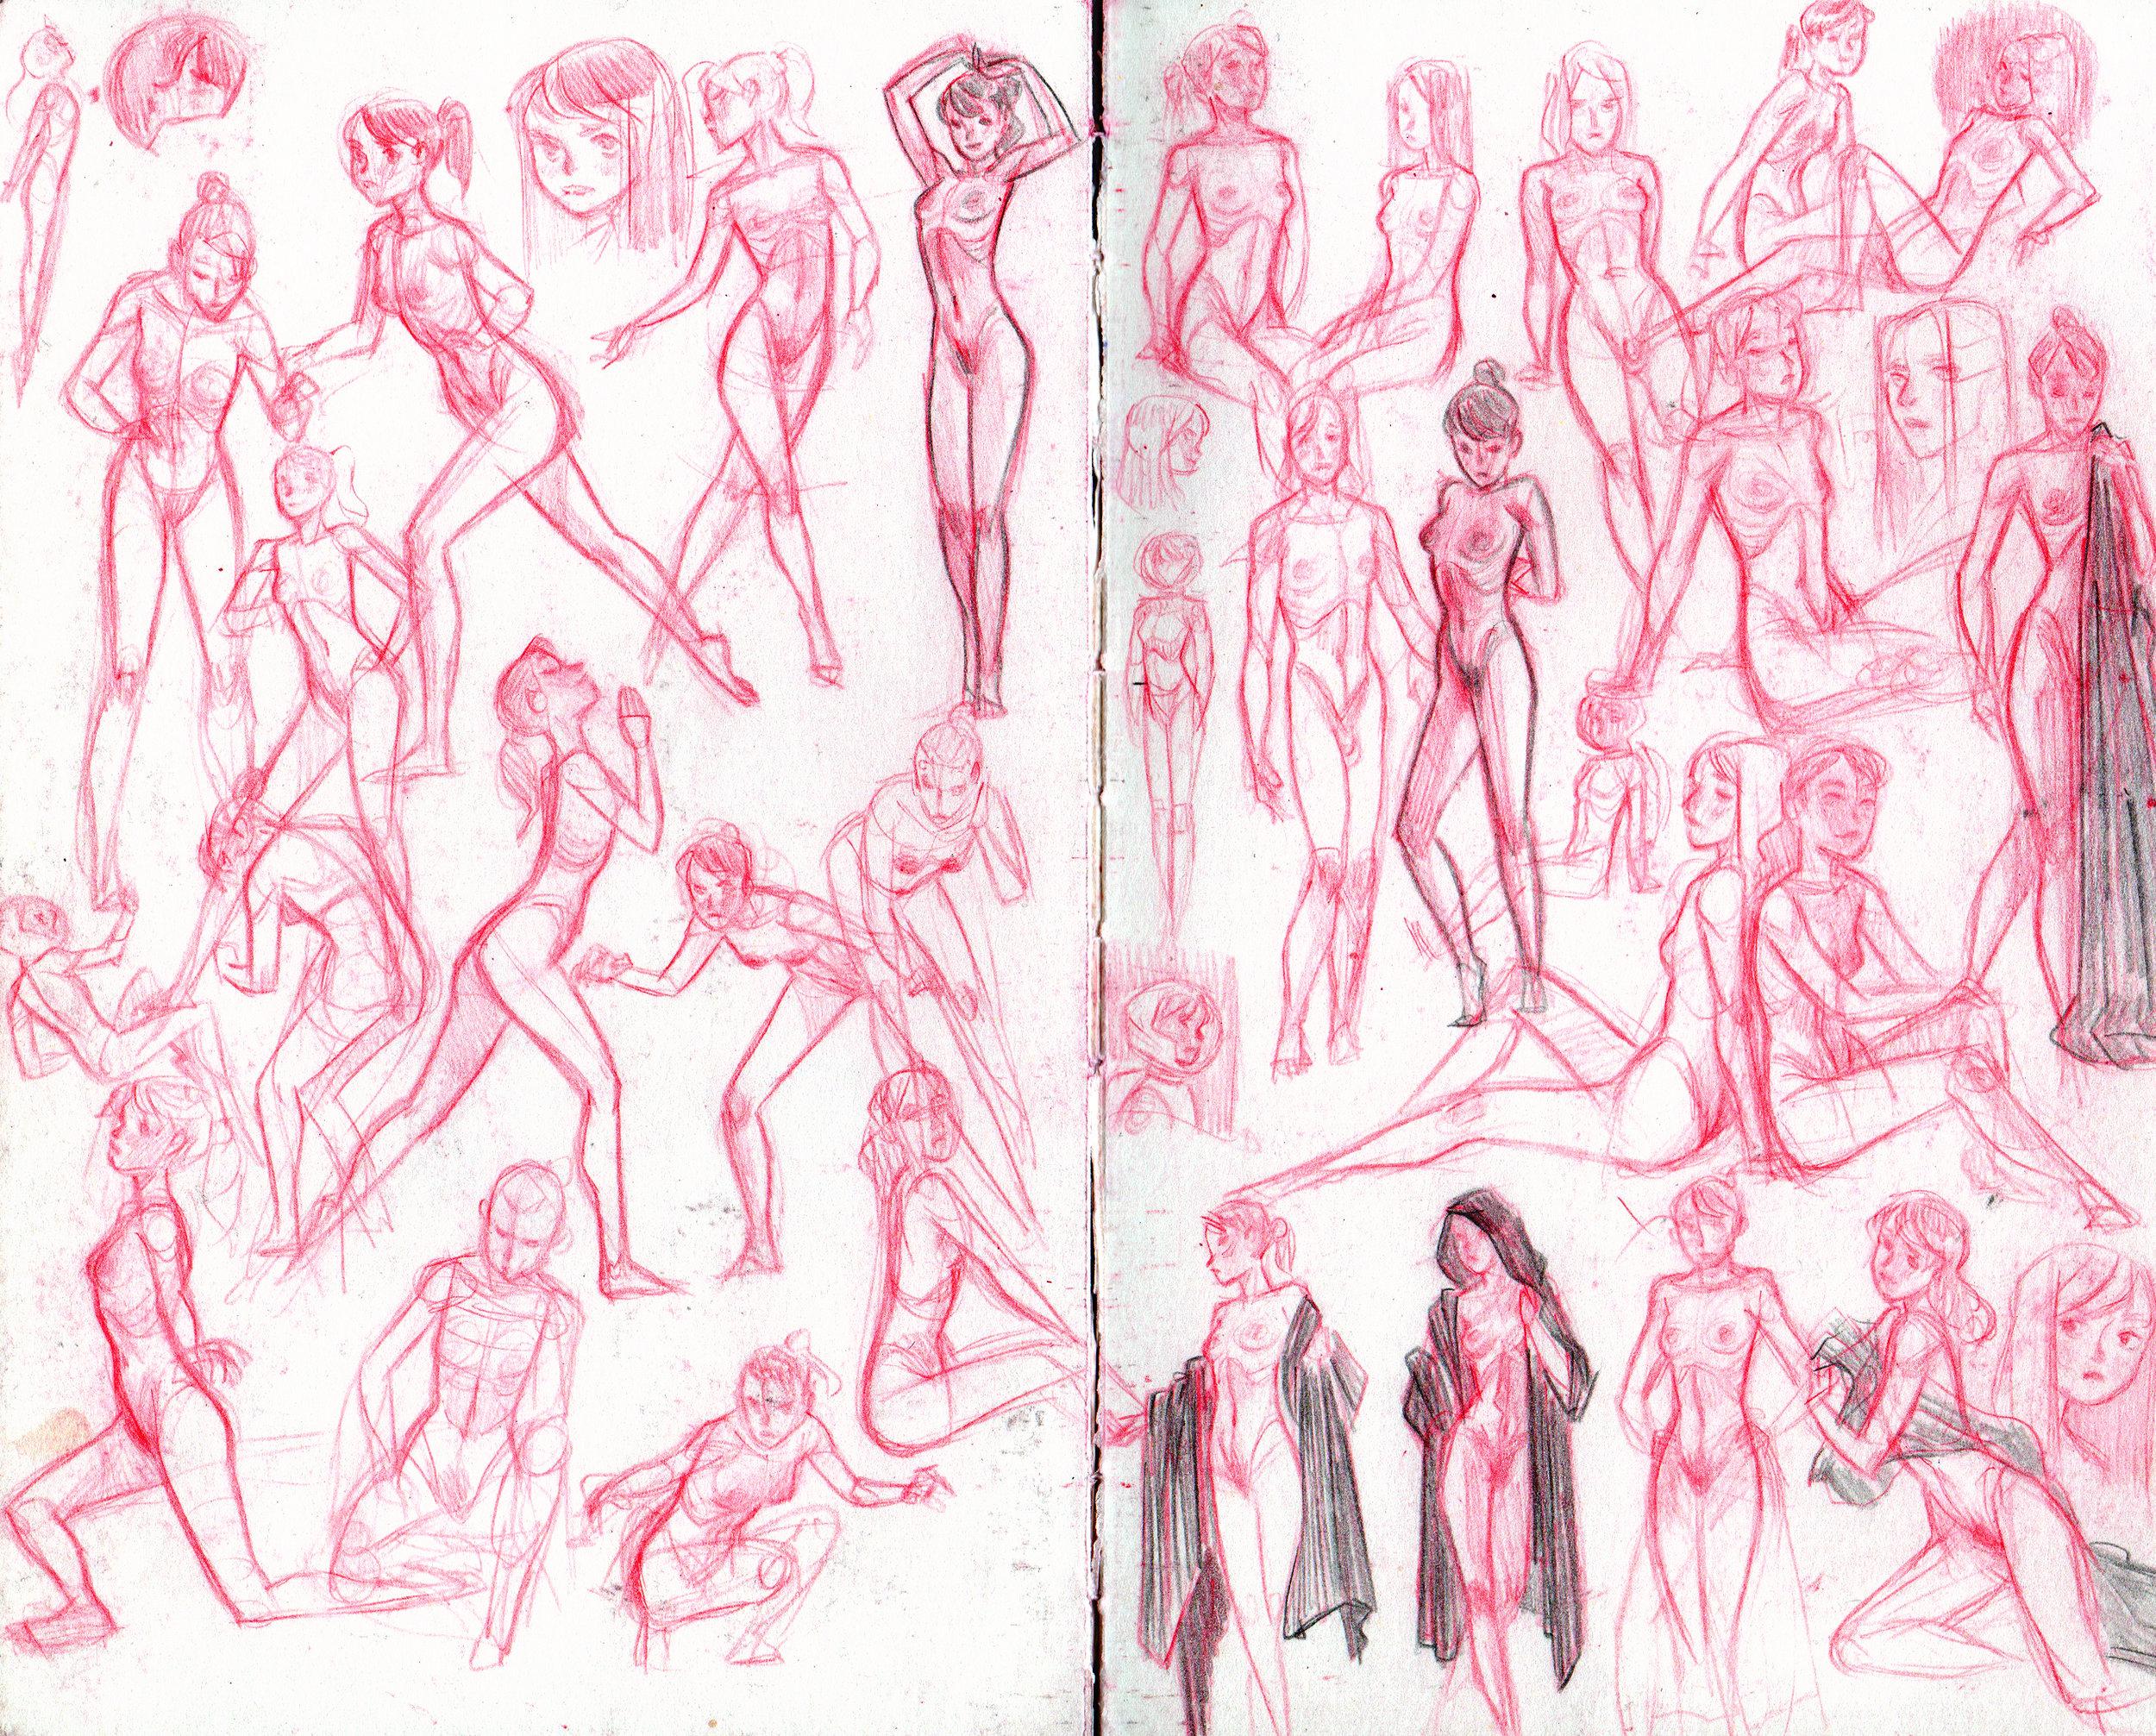 winter2018_2019 sketches5.jpg